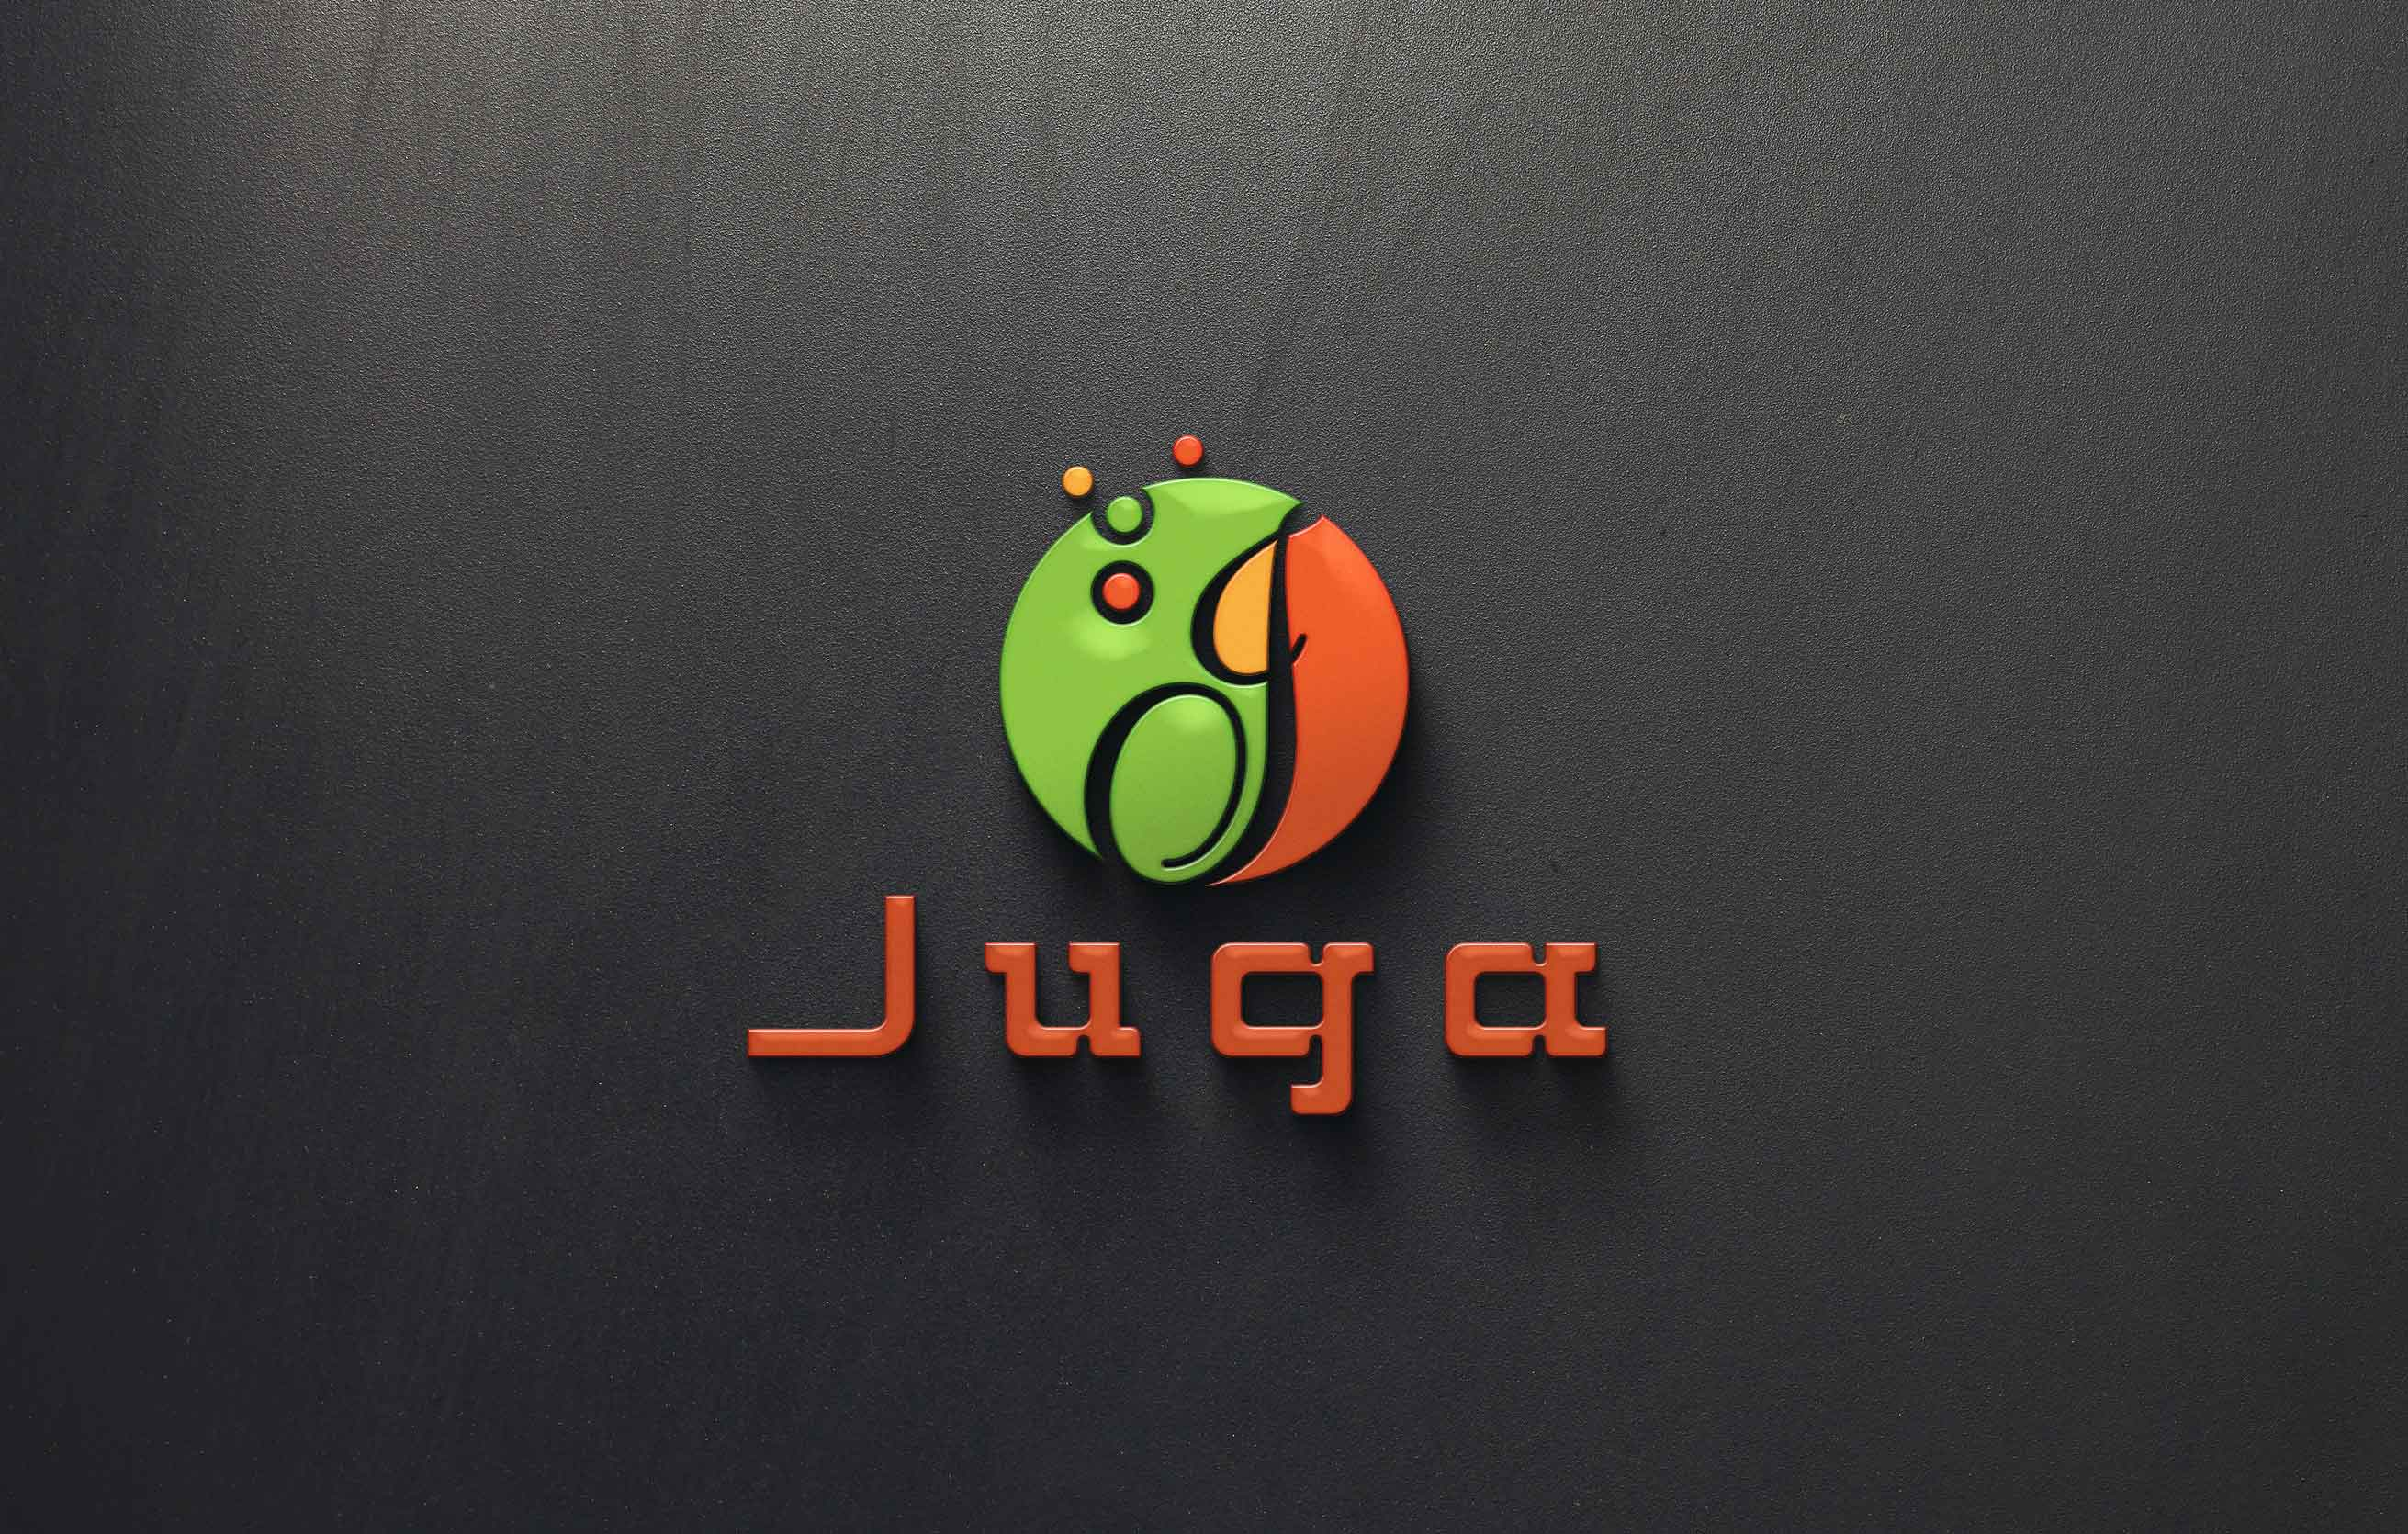 JUGA GD